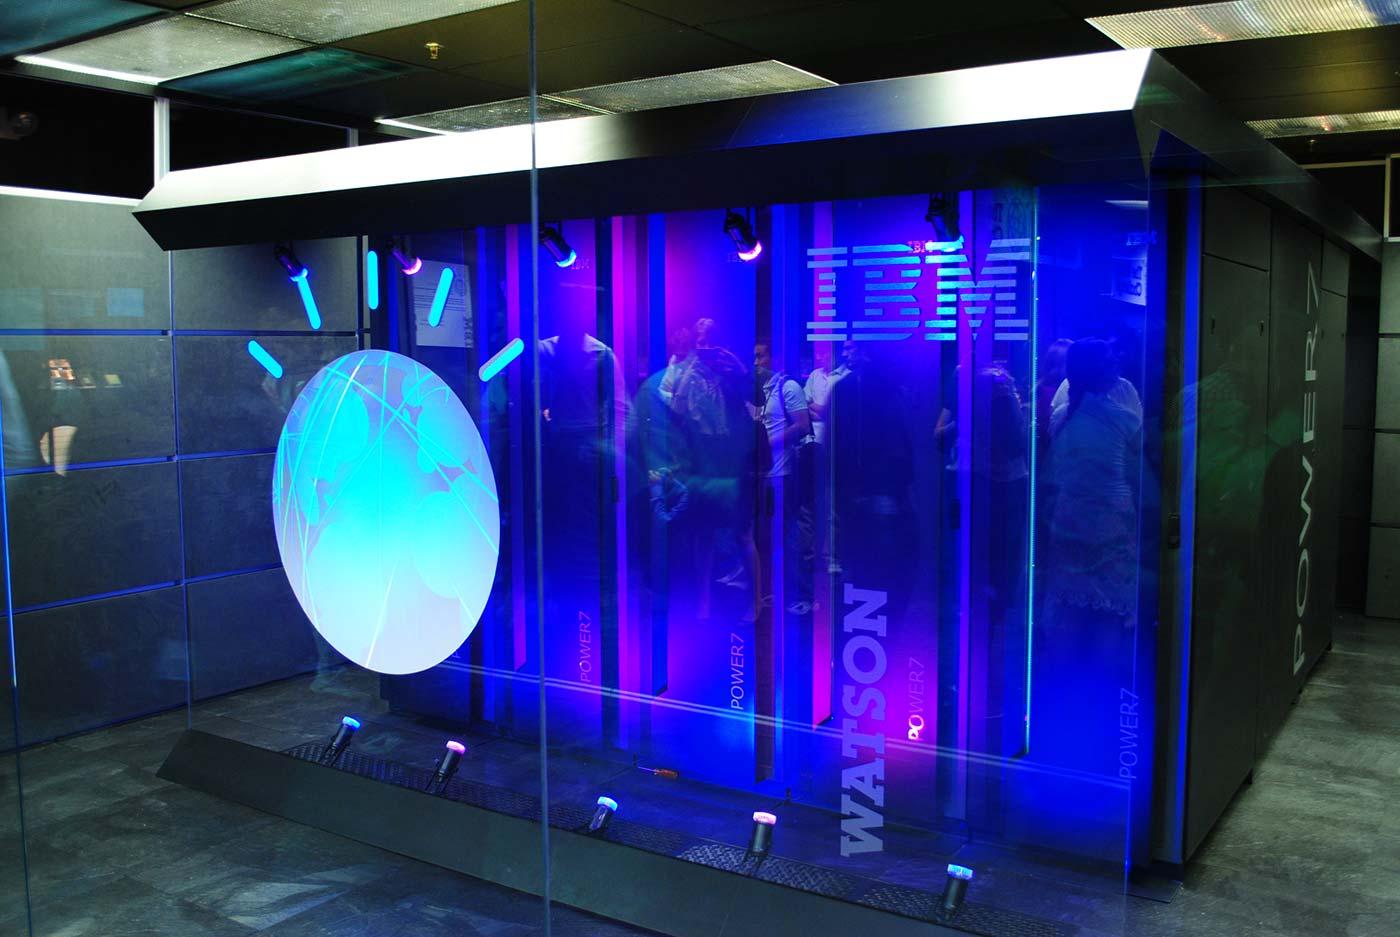 IBM's Watson computer.